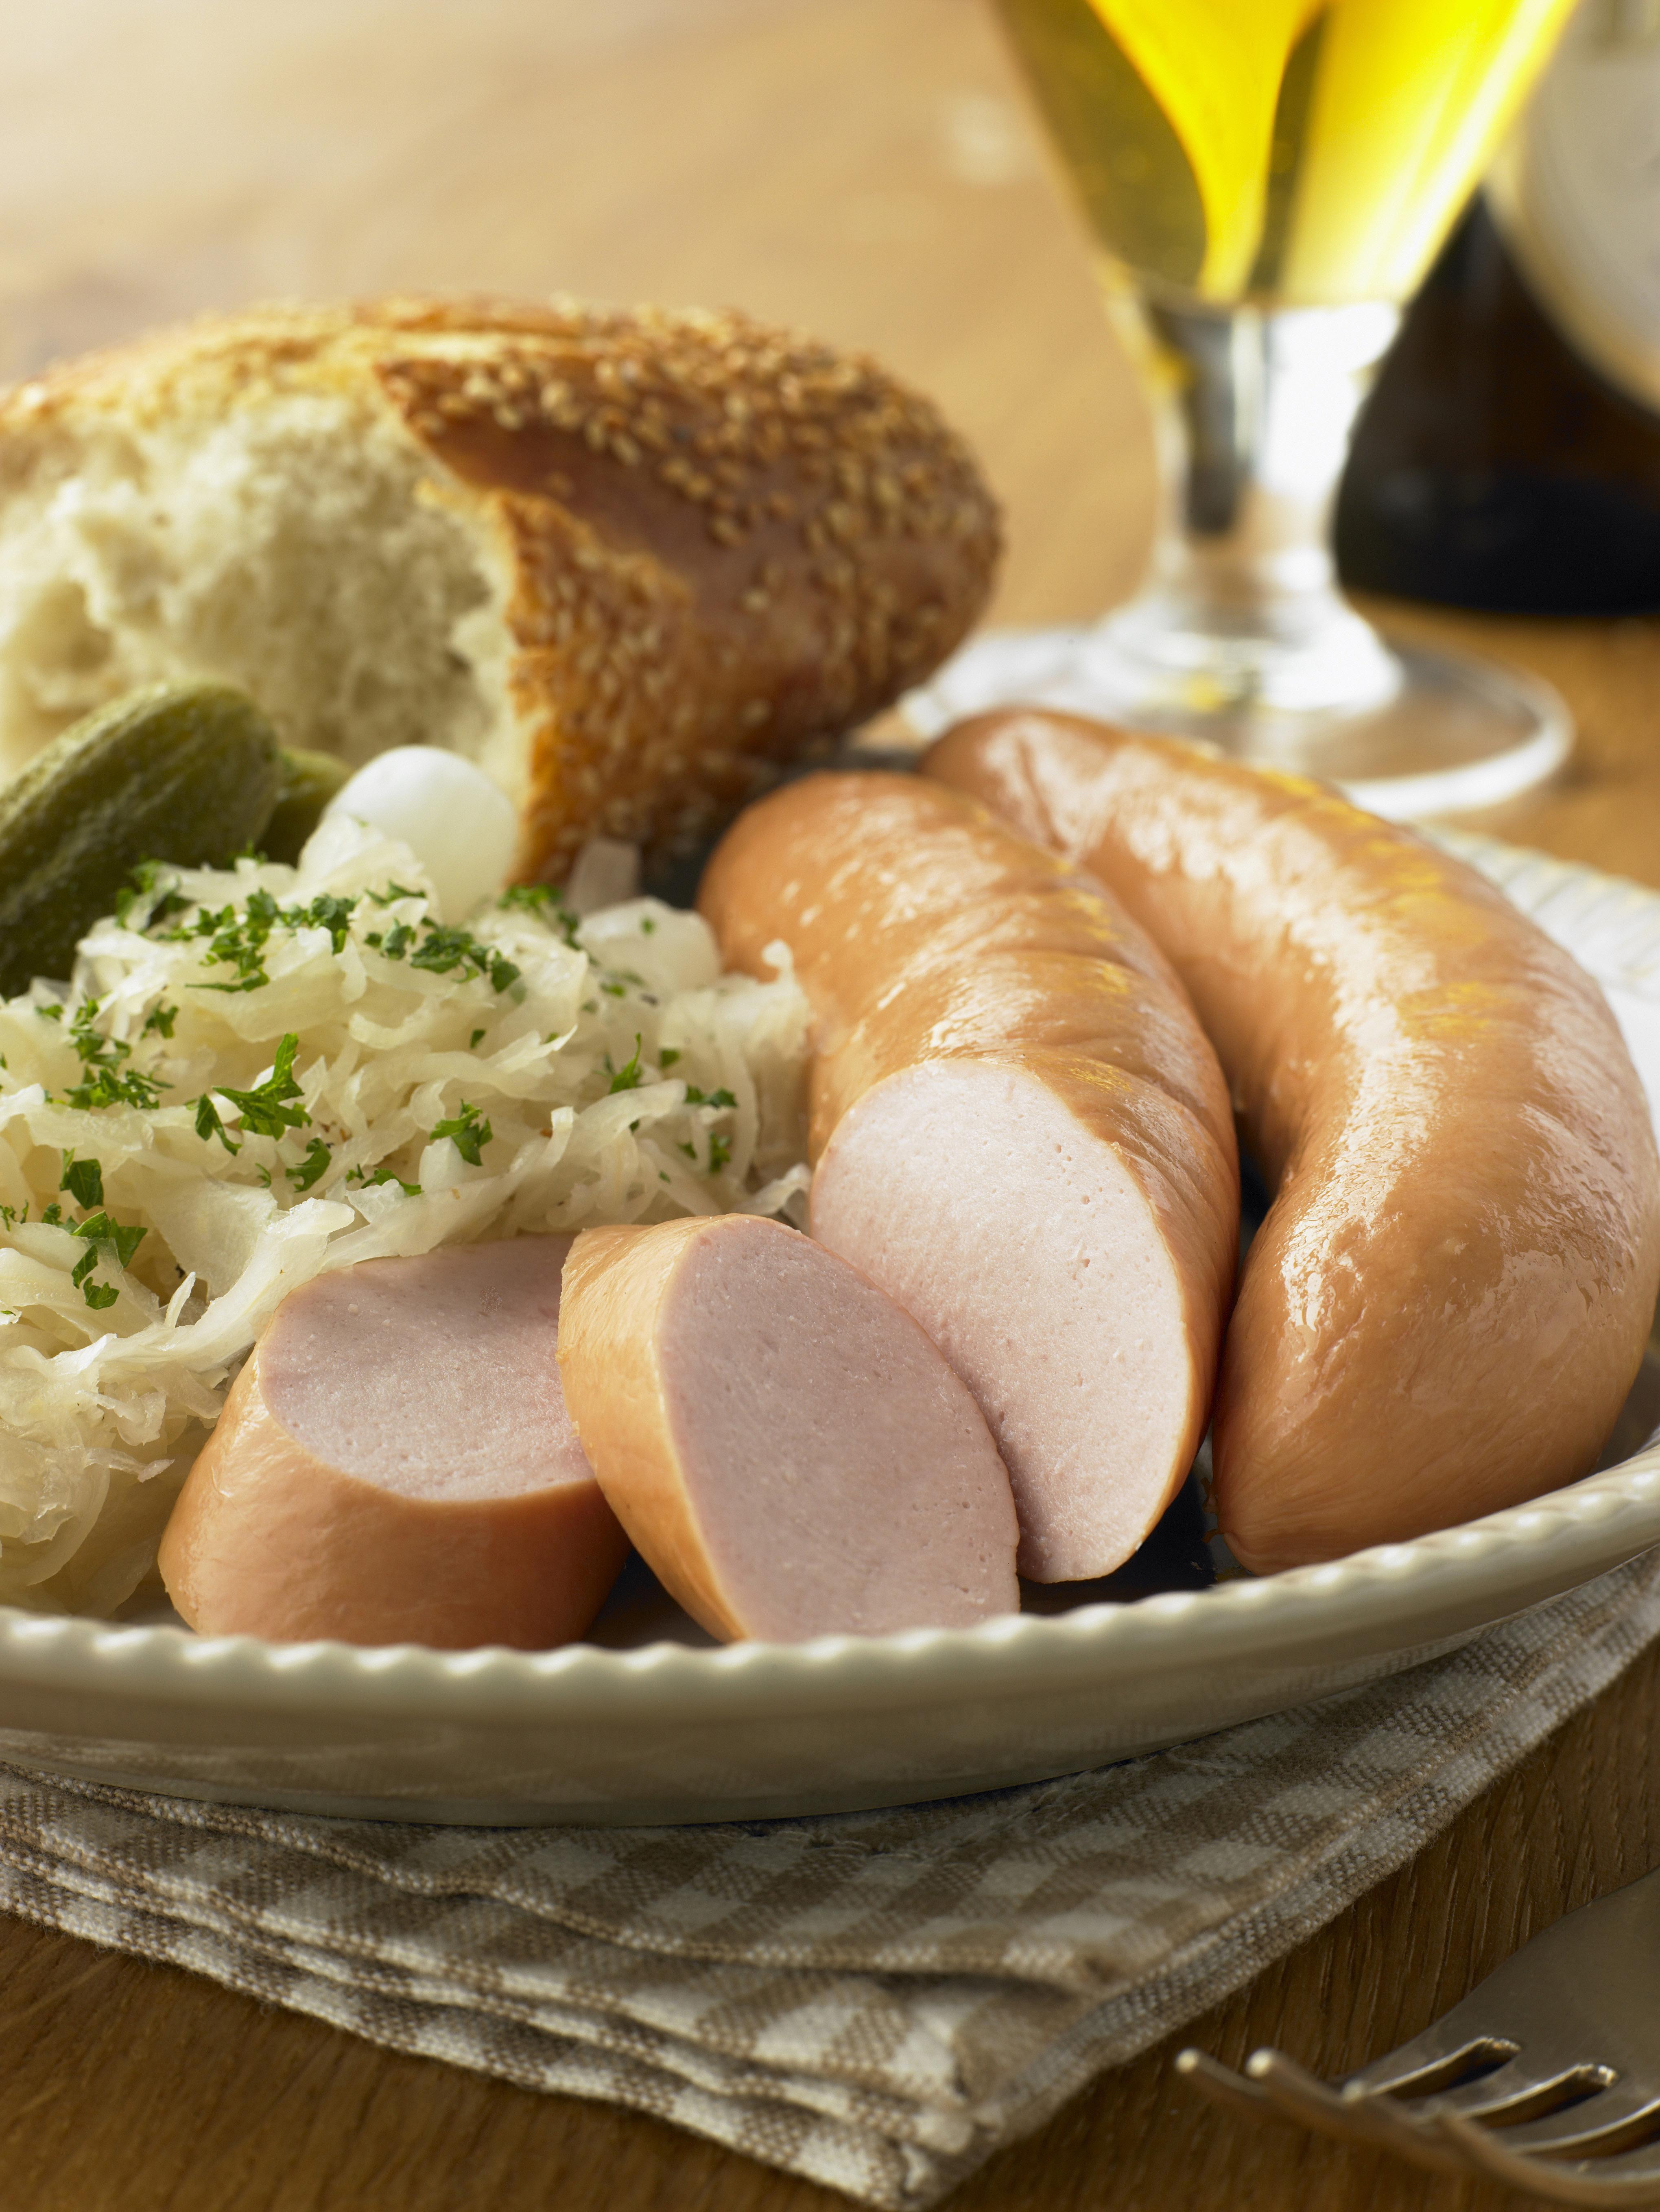 English German Food And Drink Glossary